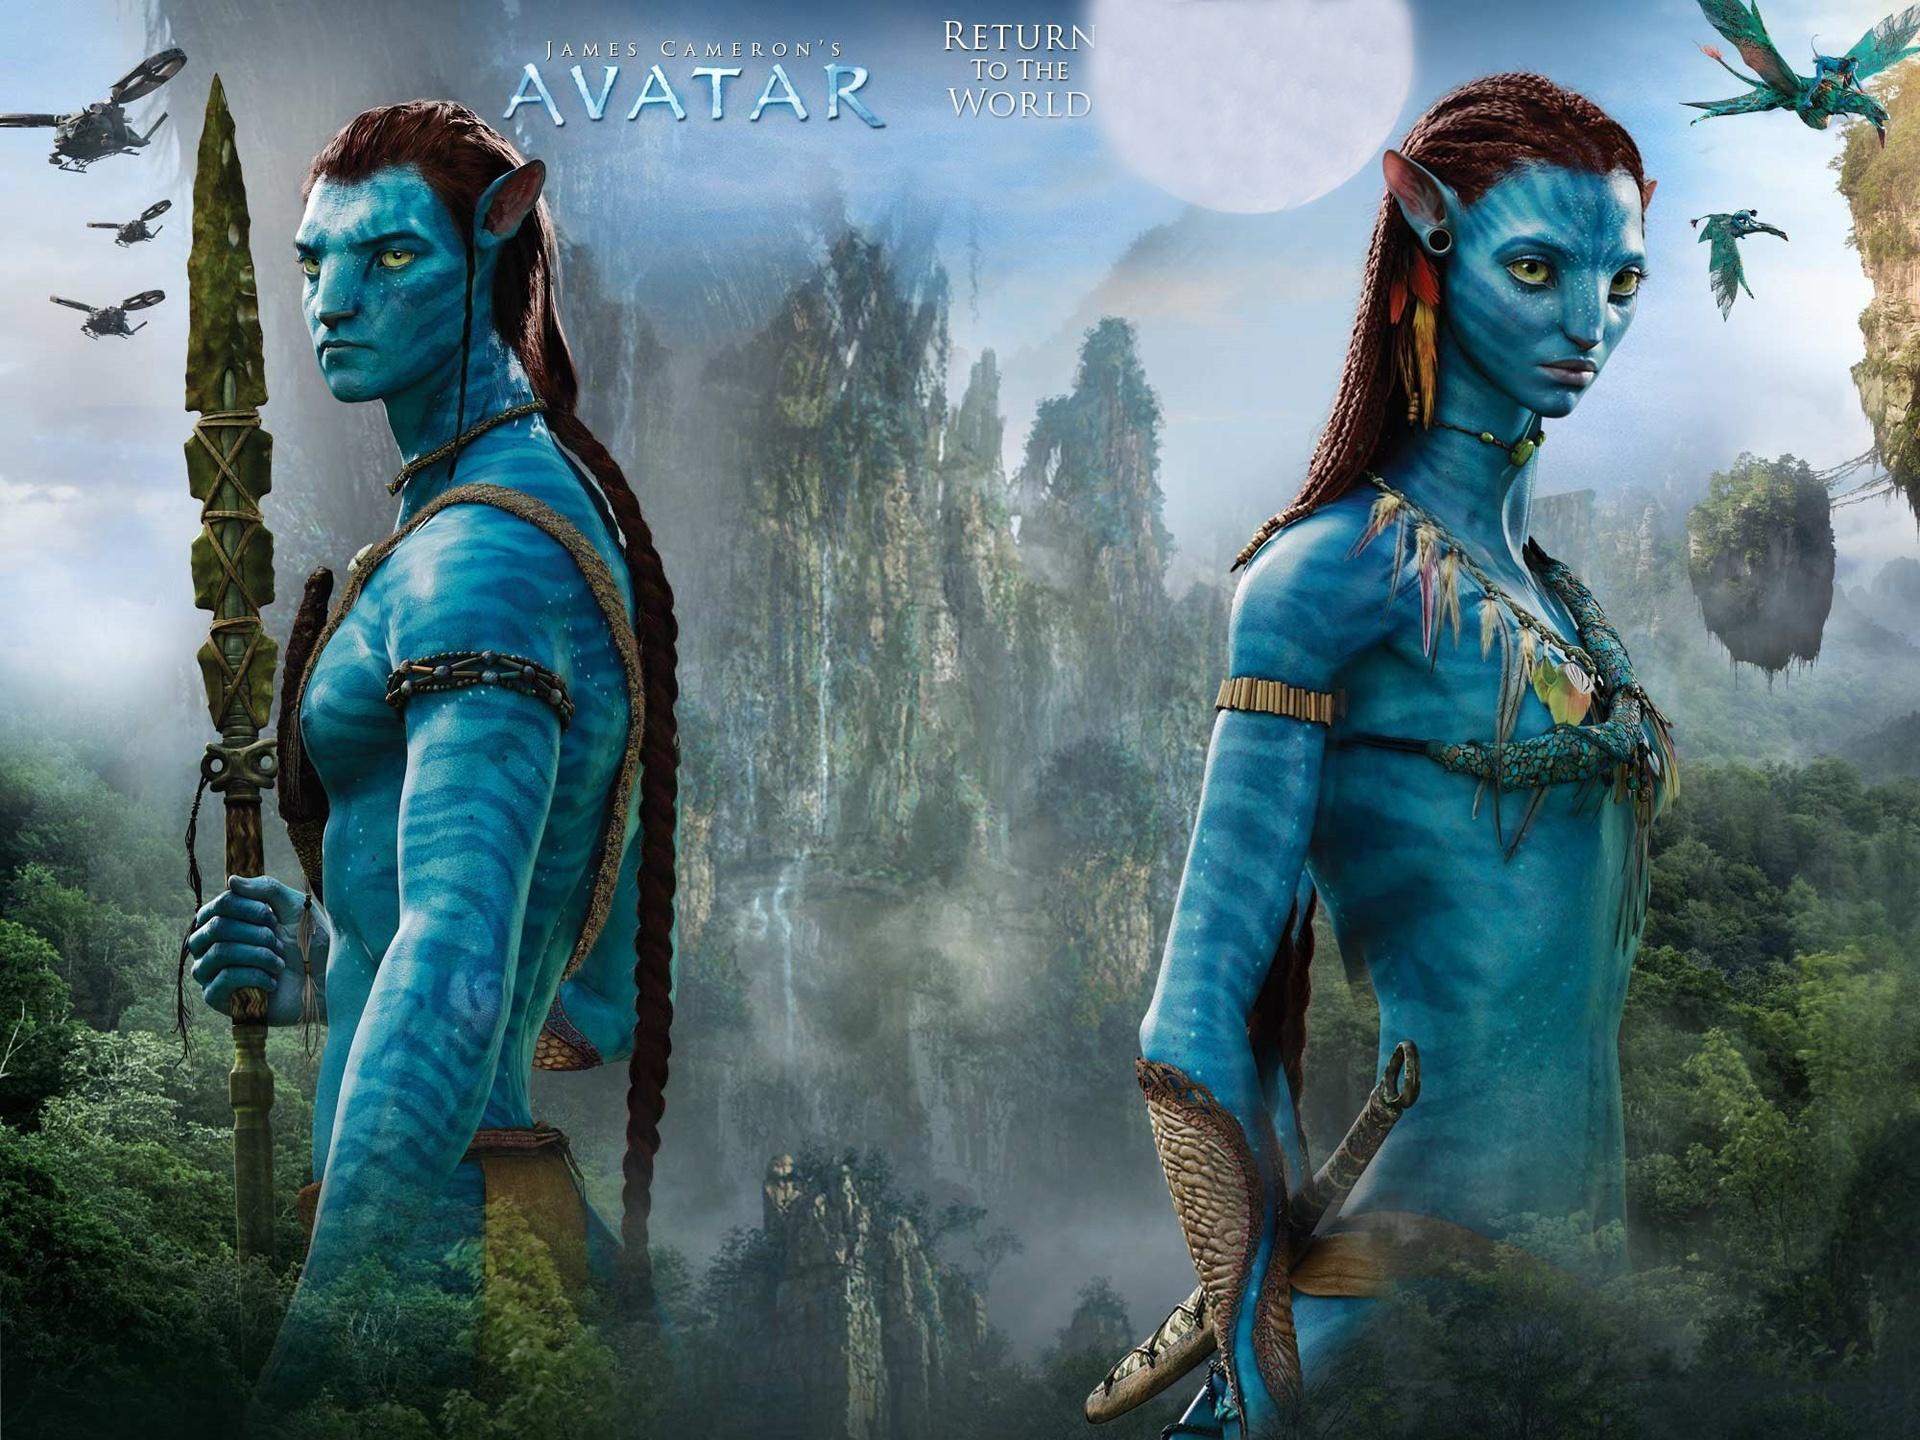 wallpaper avatar, blue skin, james cameron's movie 1920x1440 hd